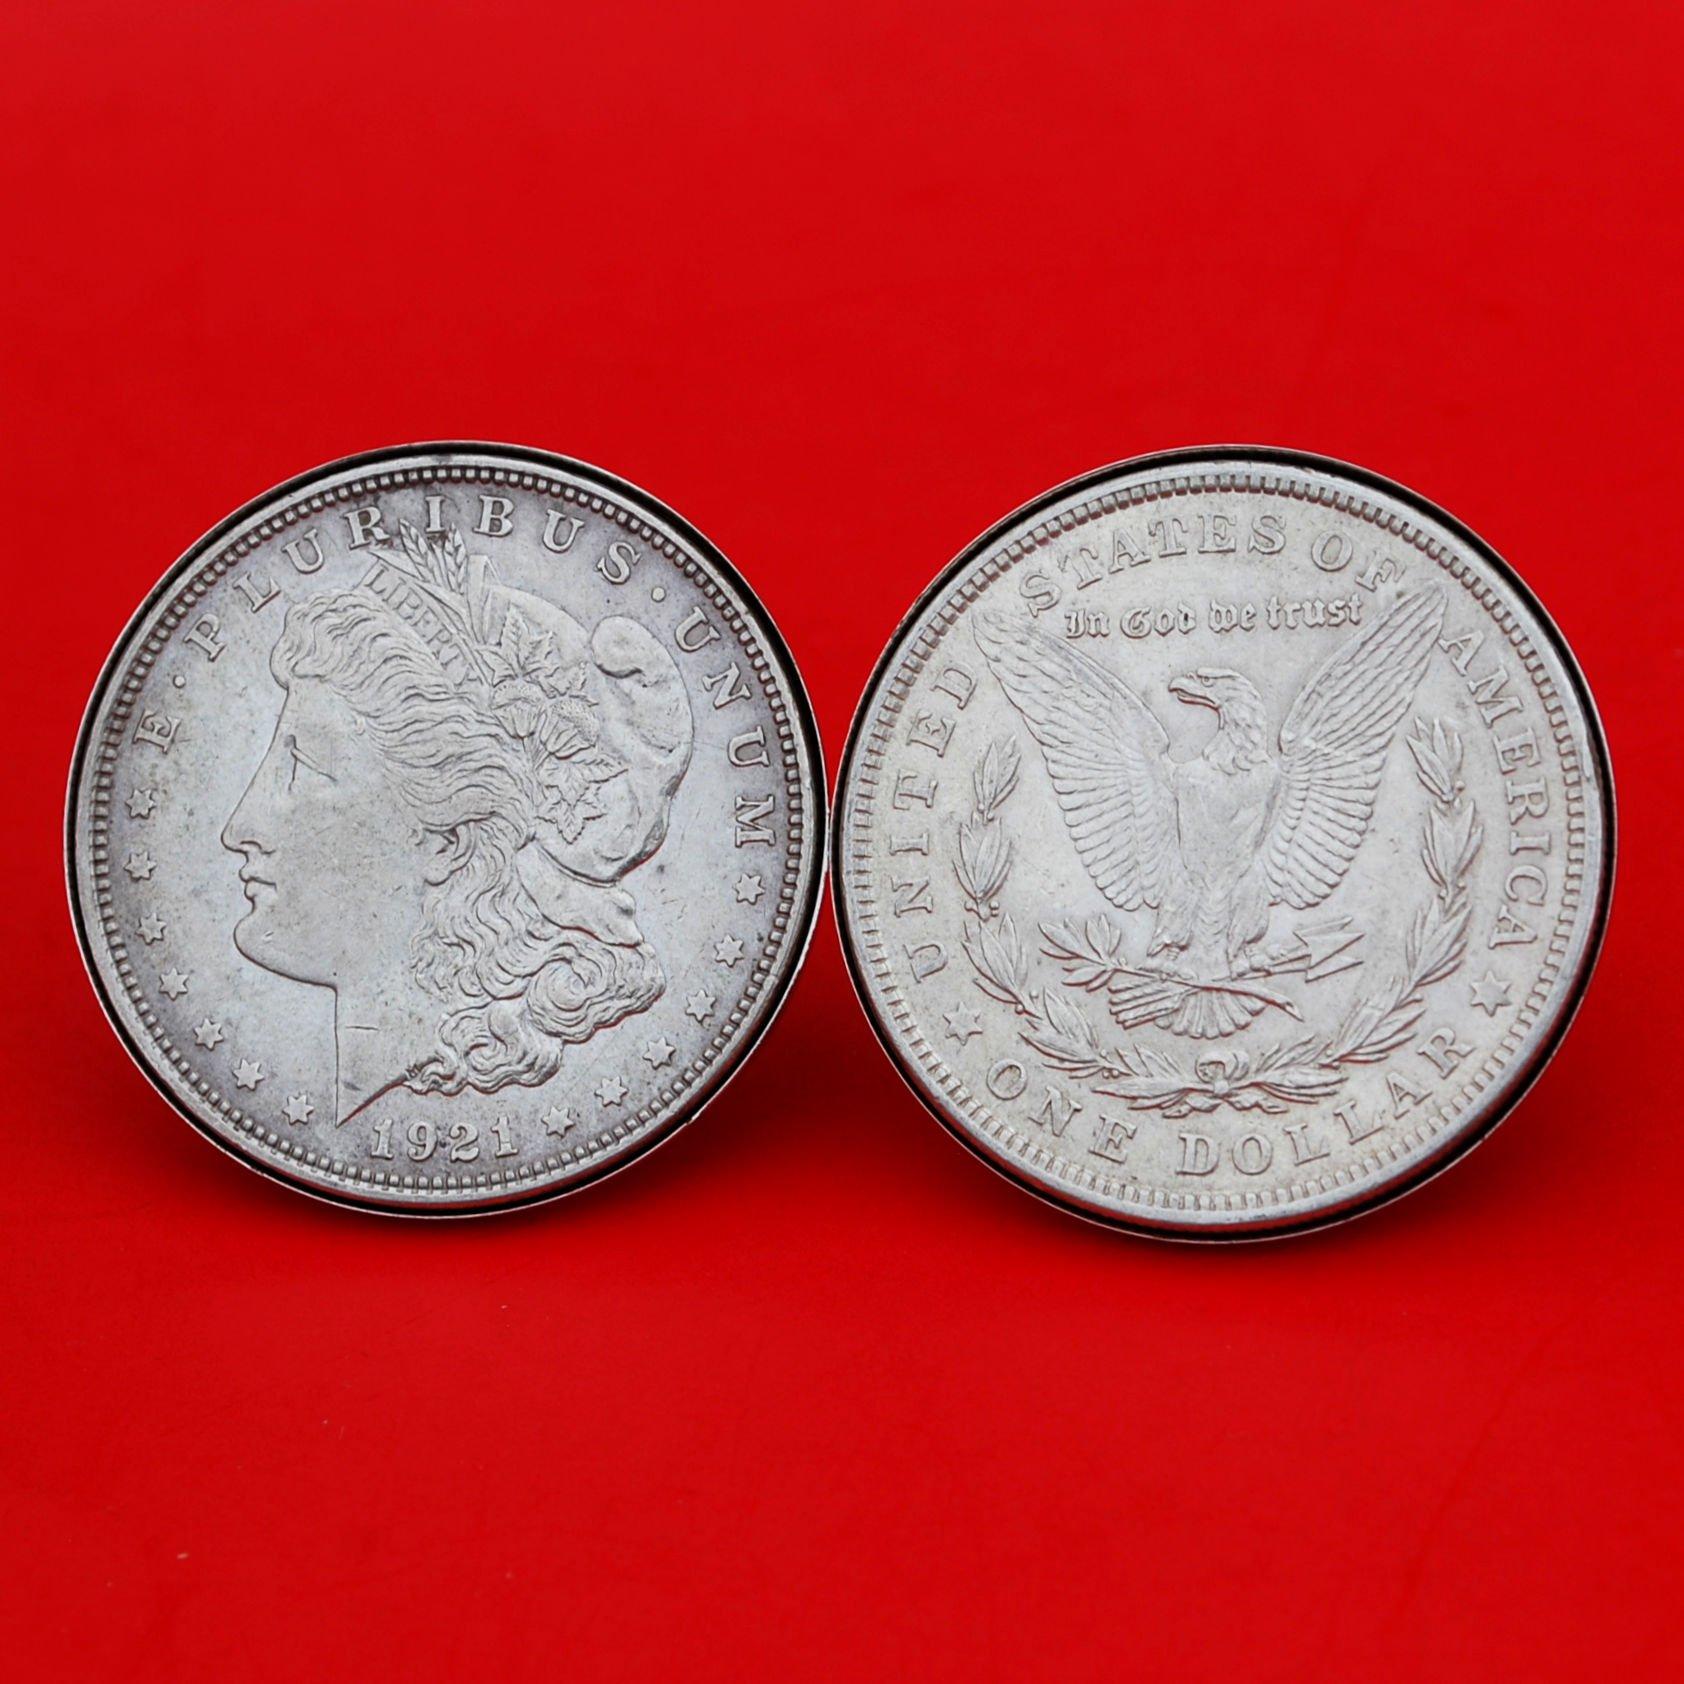 US 1921 Morgan Silver Dollar Silver Cufflinks NEW - OBVERSE + REVERSE